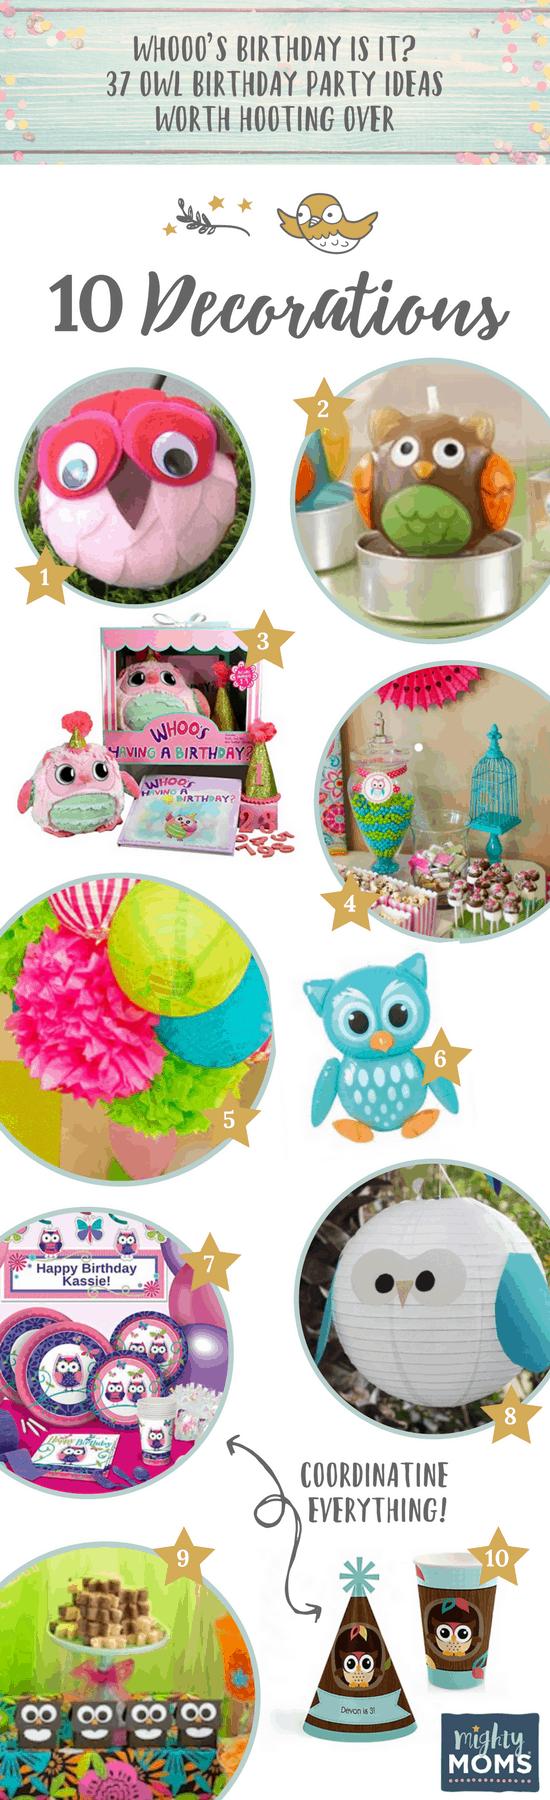 10 Decoration Ideas for an Owl Birthday Party - MightyMoms.club